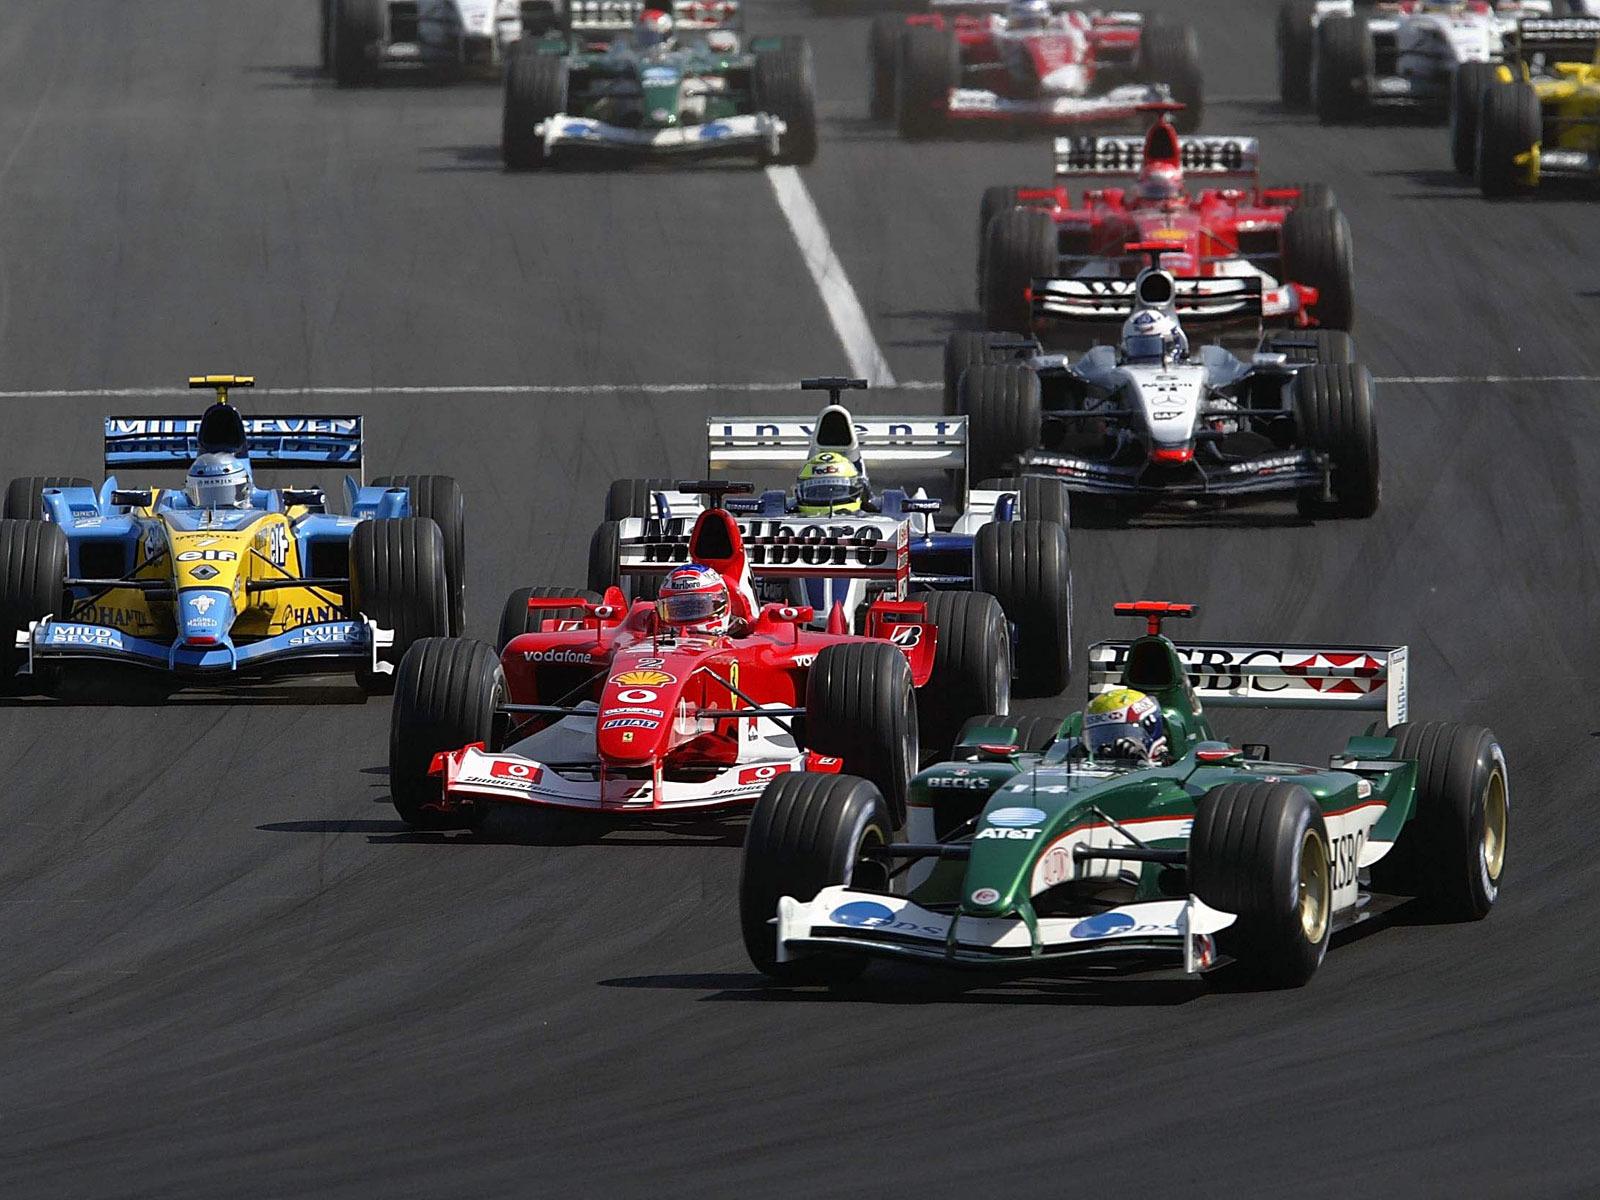 Grupo GP Hungria 2003